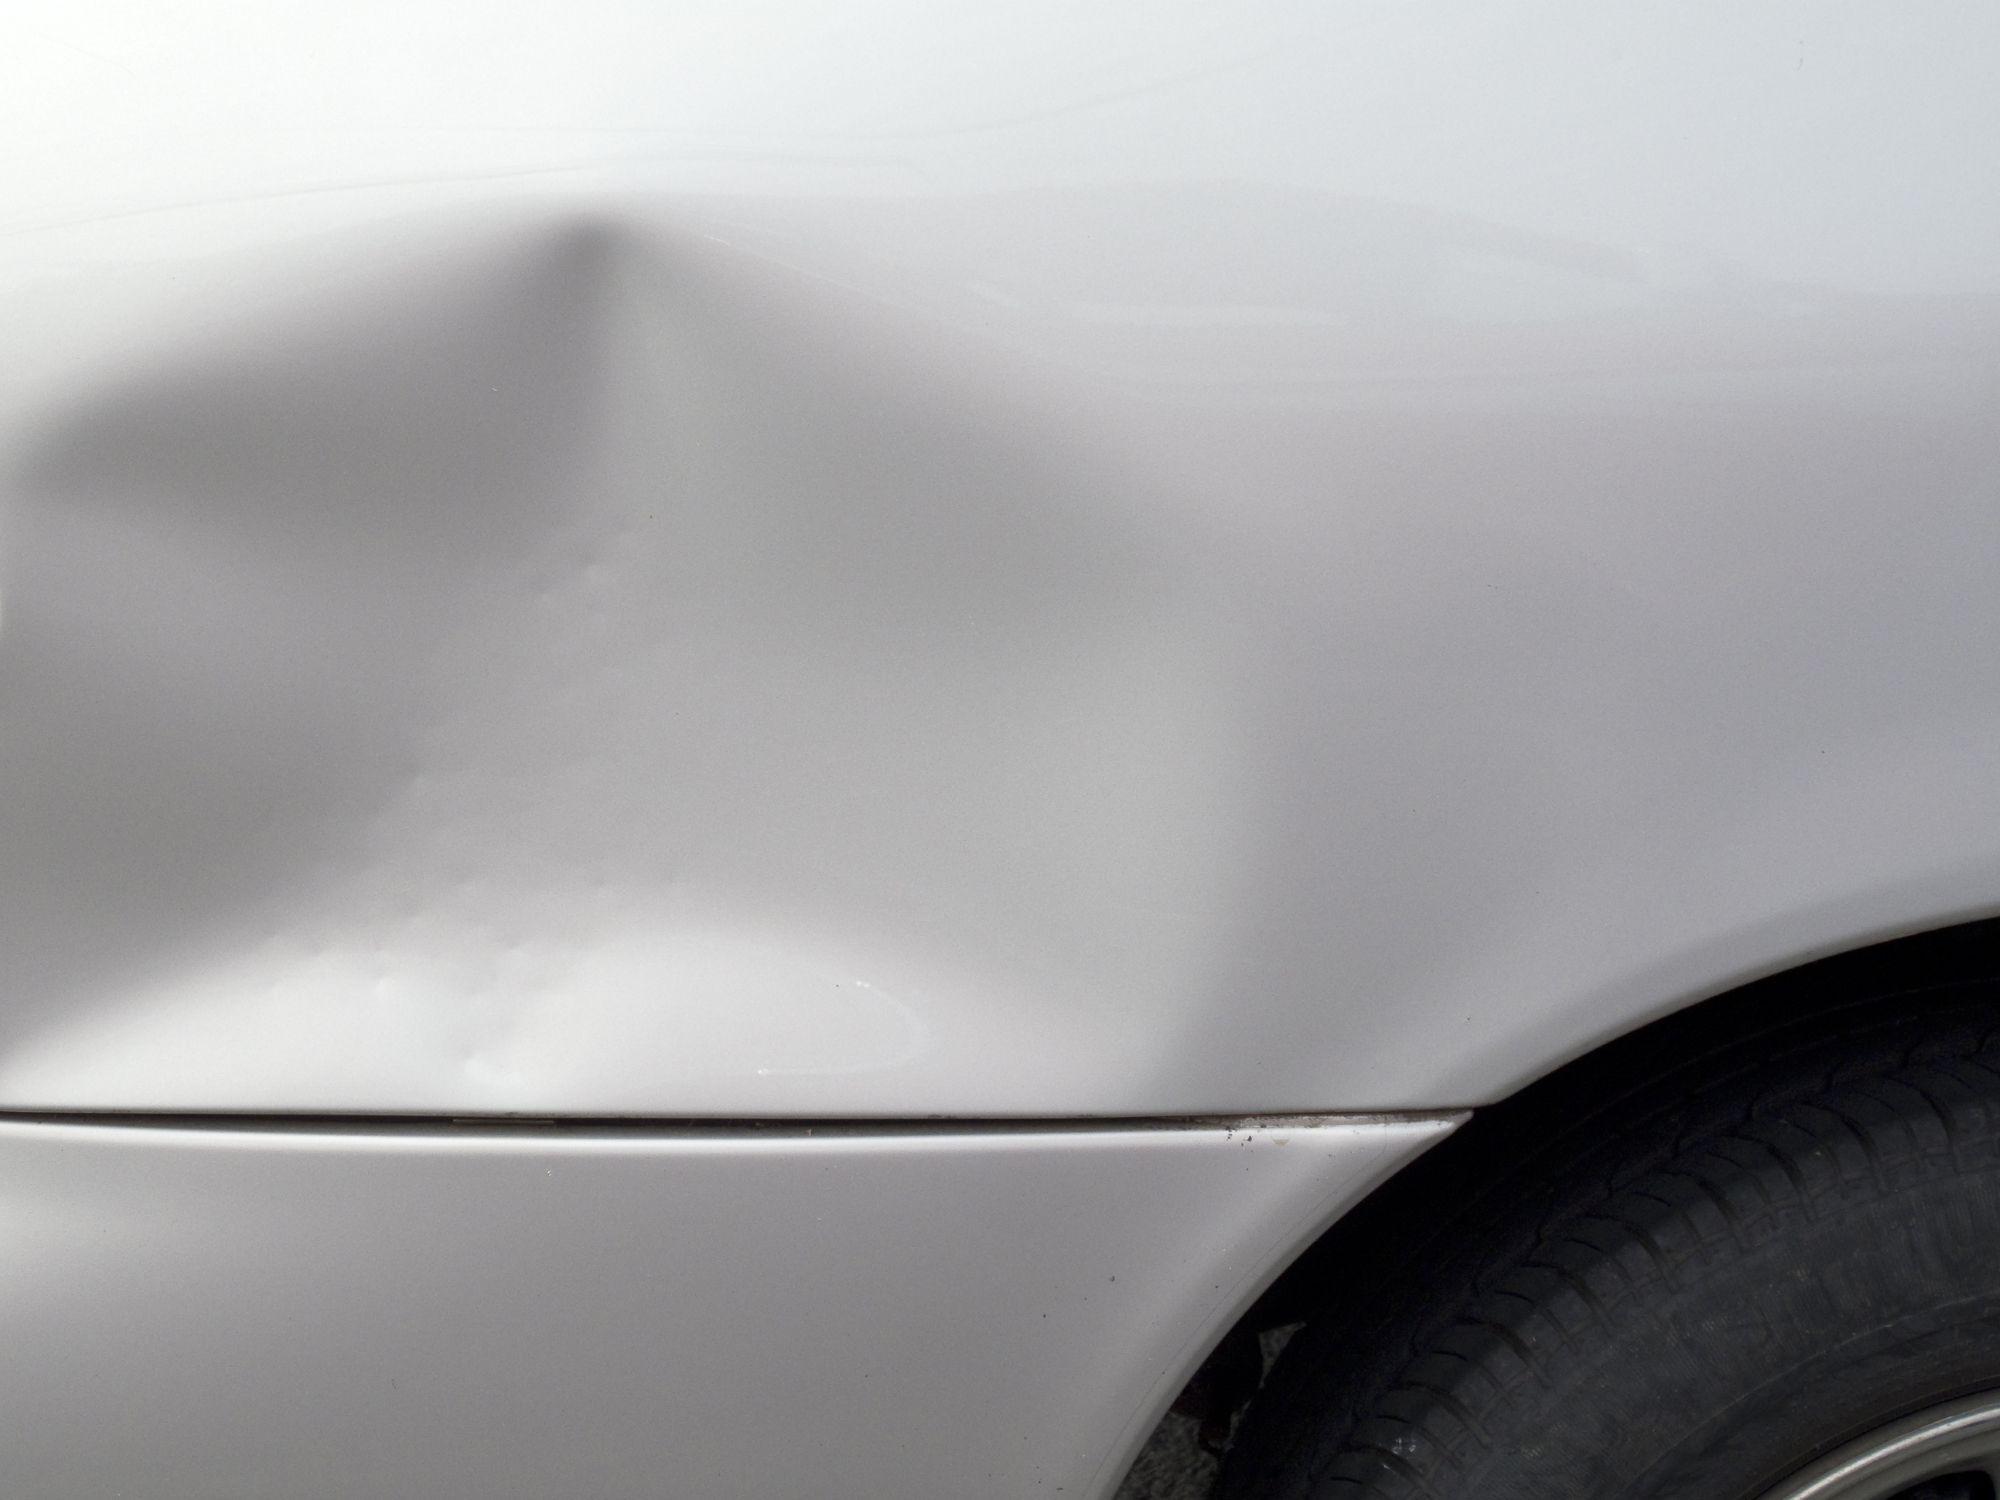 image of dented rear fender